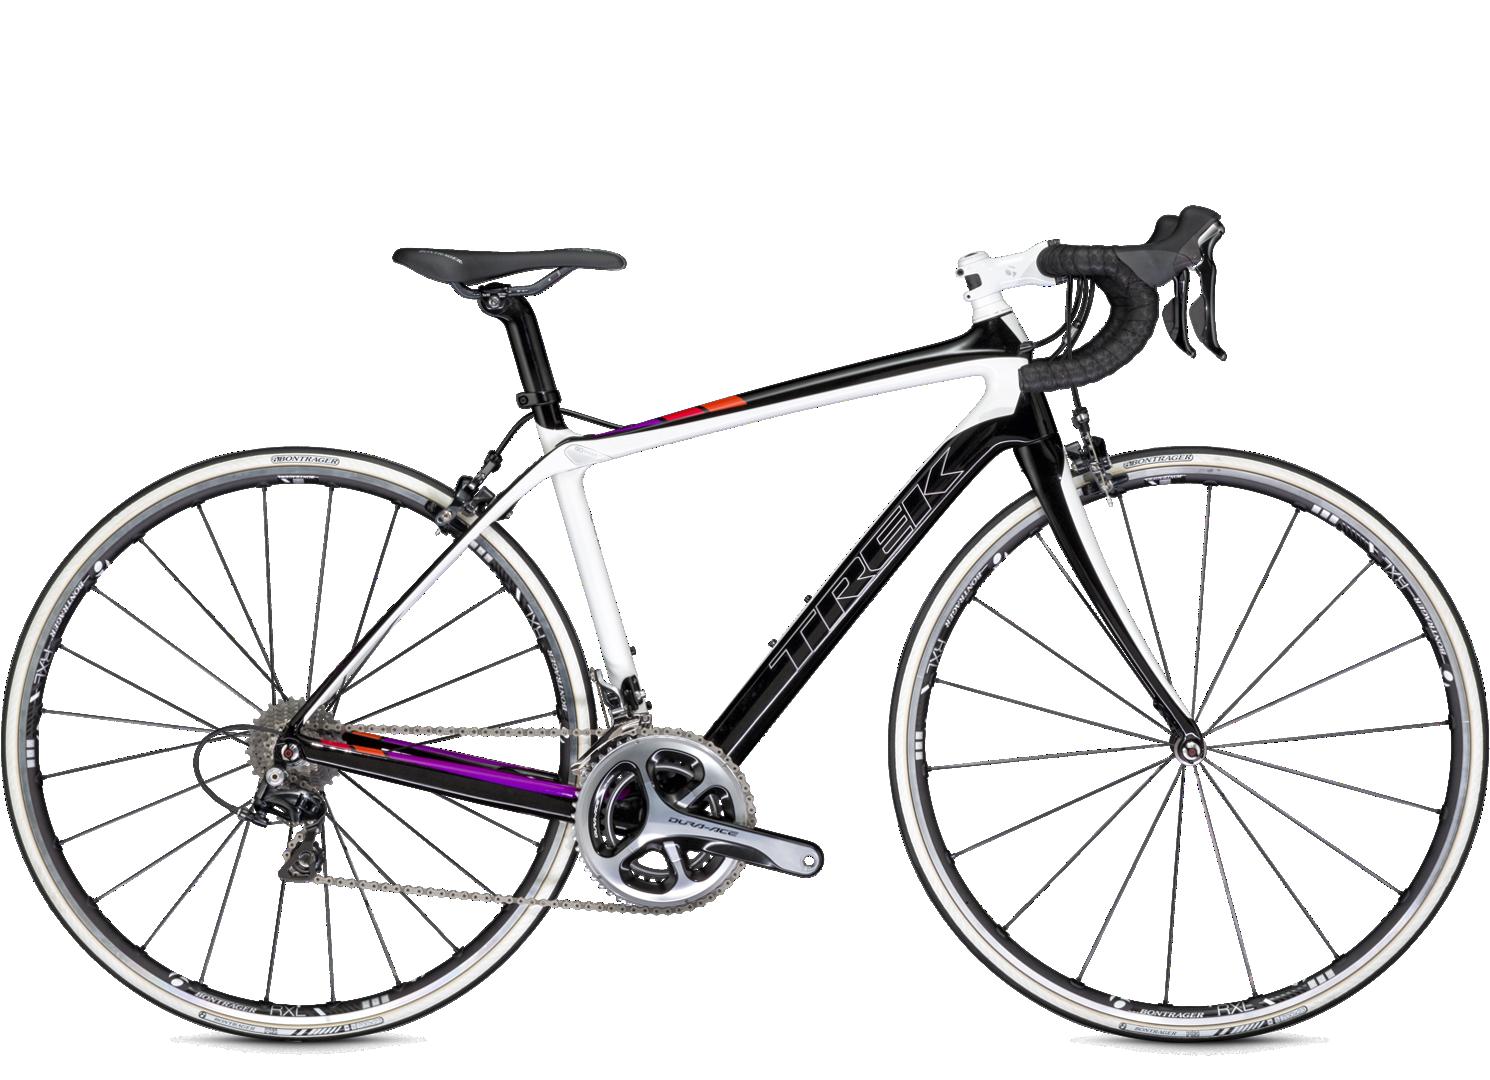 Domane Trek Bicycle